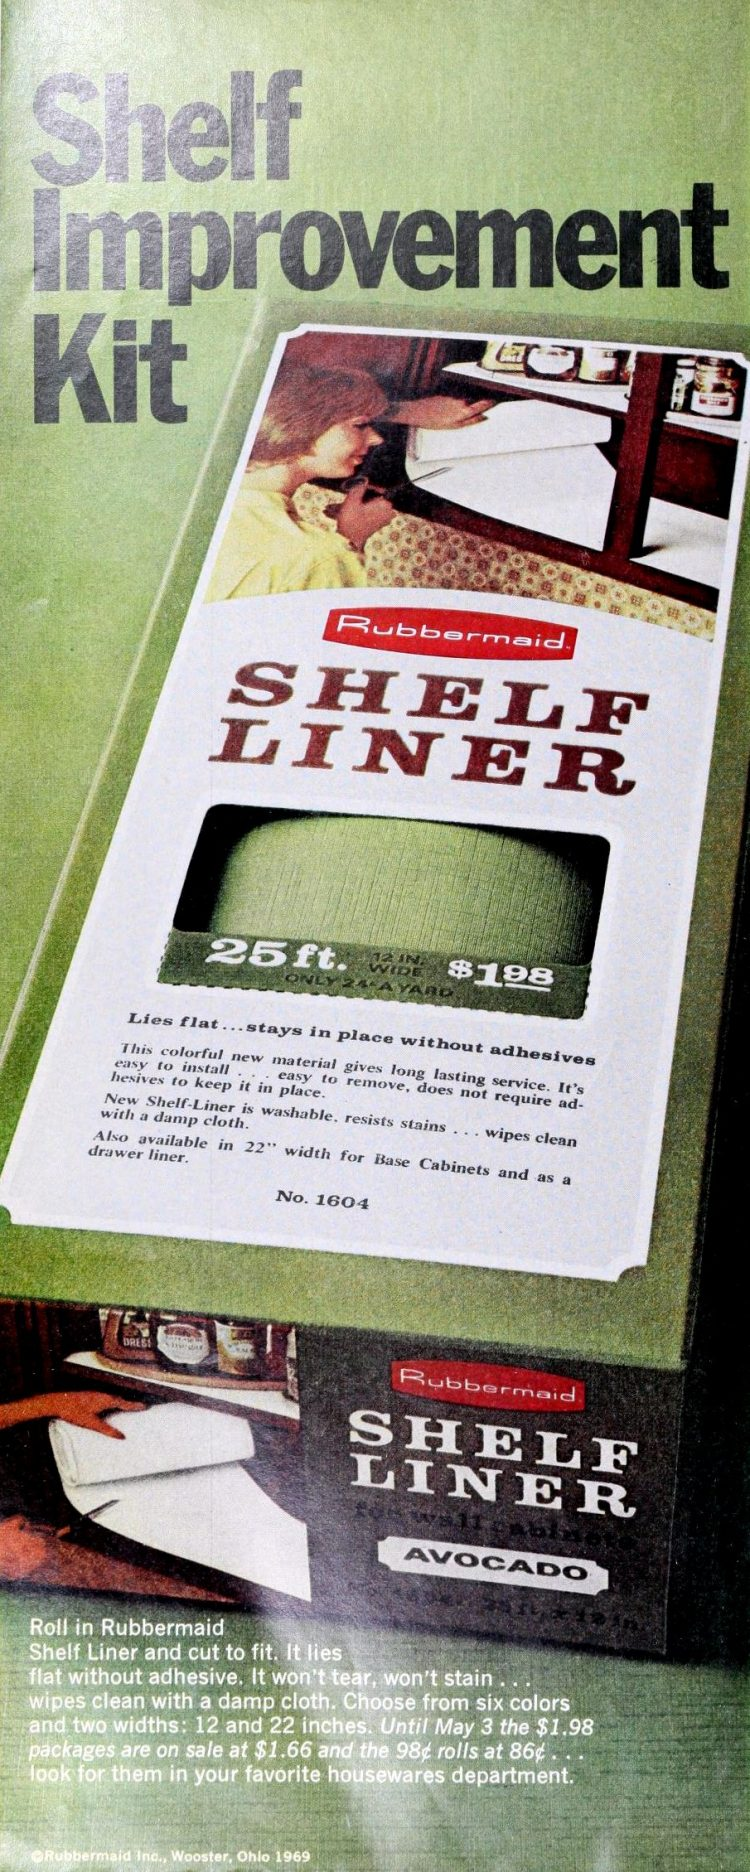 Rubbermaid shelf liner 1970